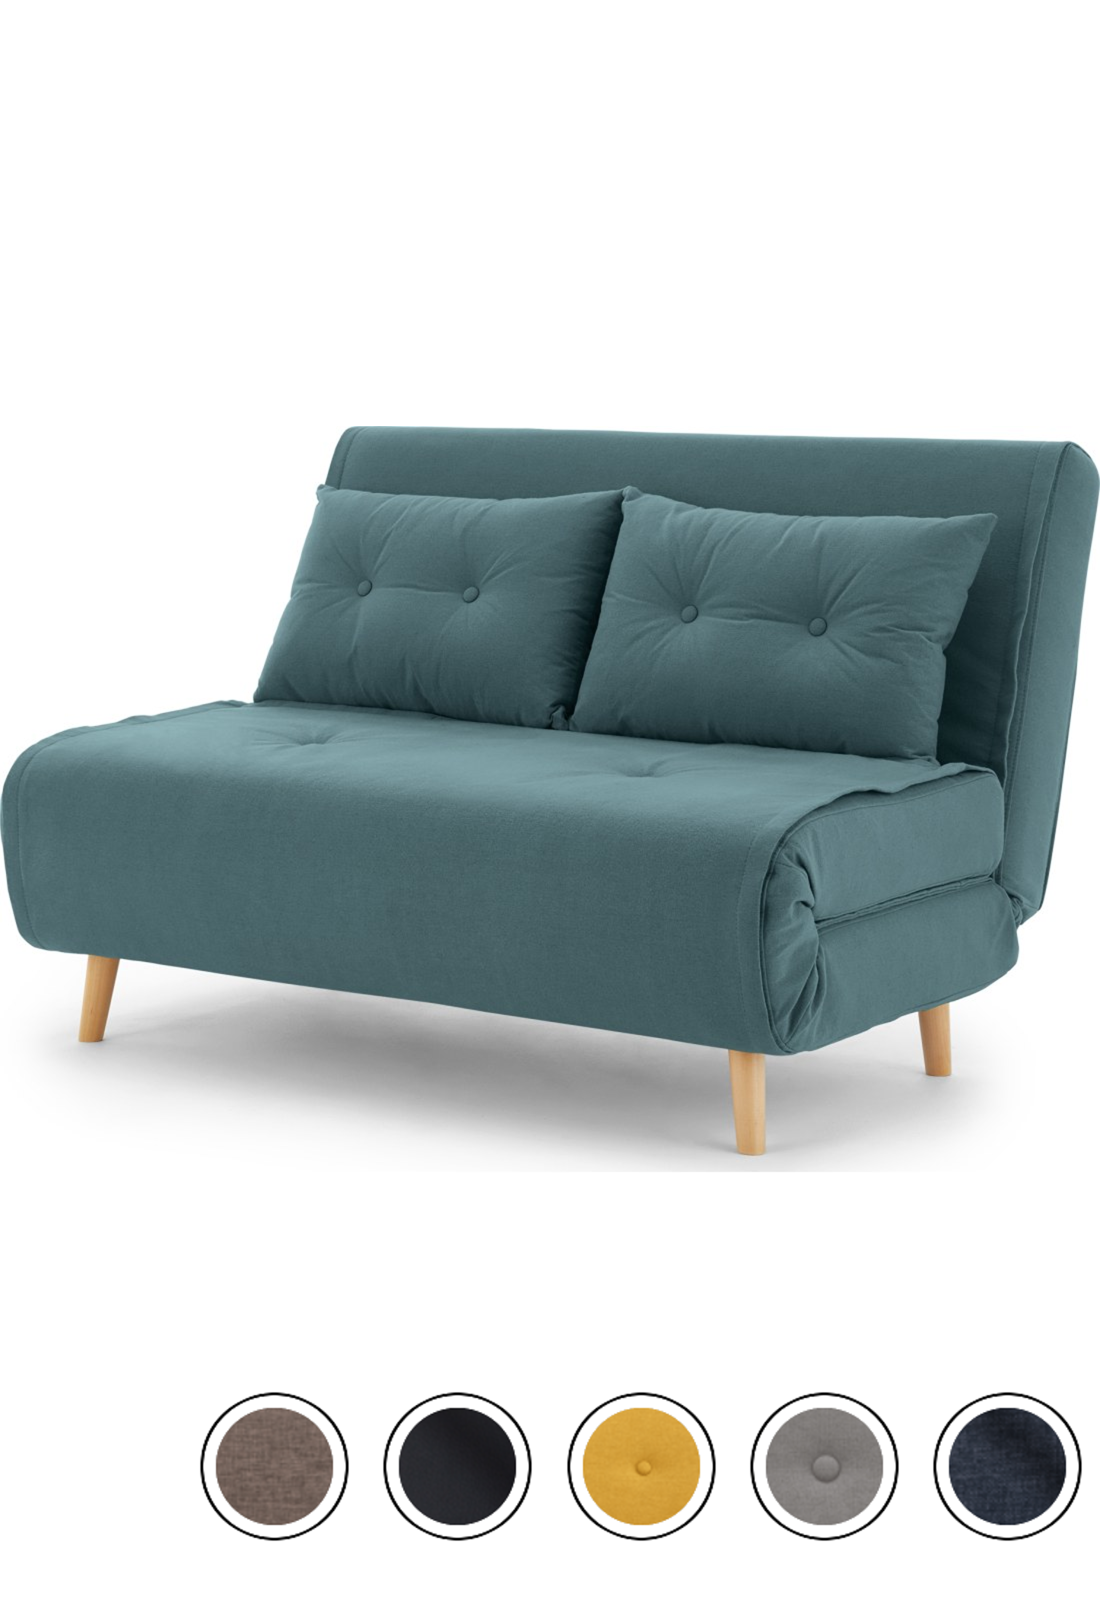 Haru Small Sofa Bed Sherbet Blue V 2020 G Dizajn Kuhni Mebel Divan